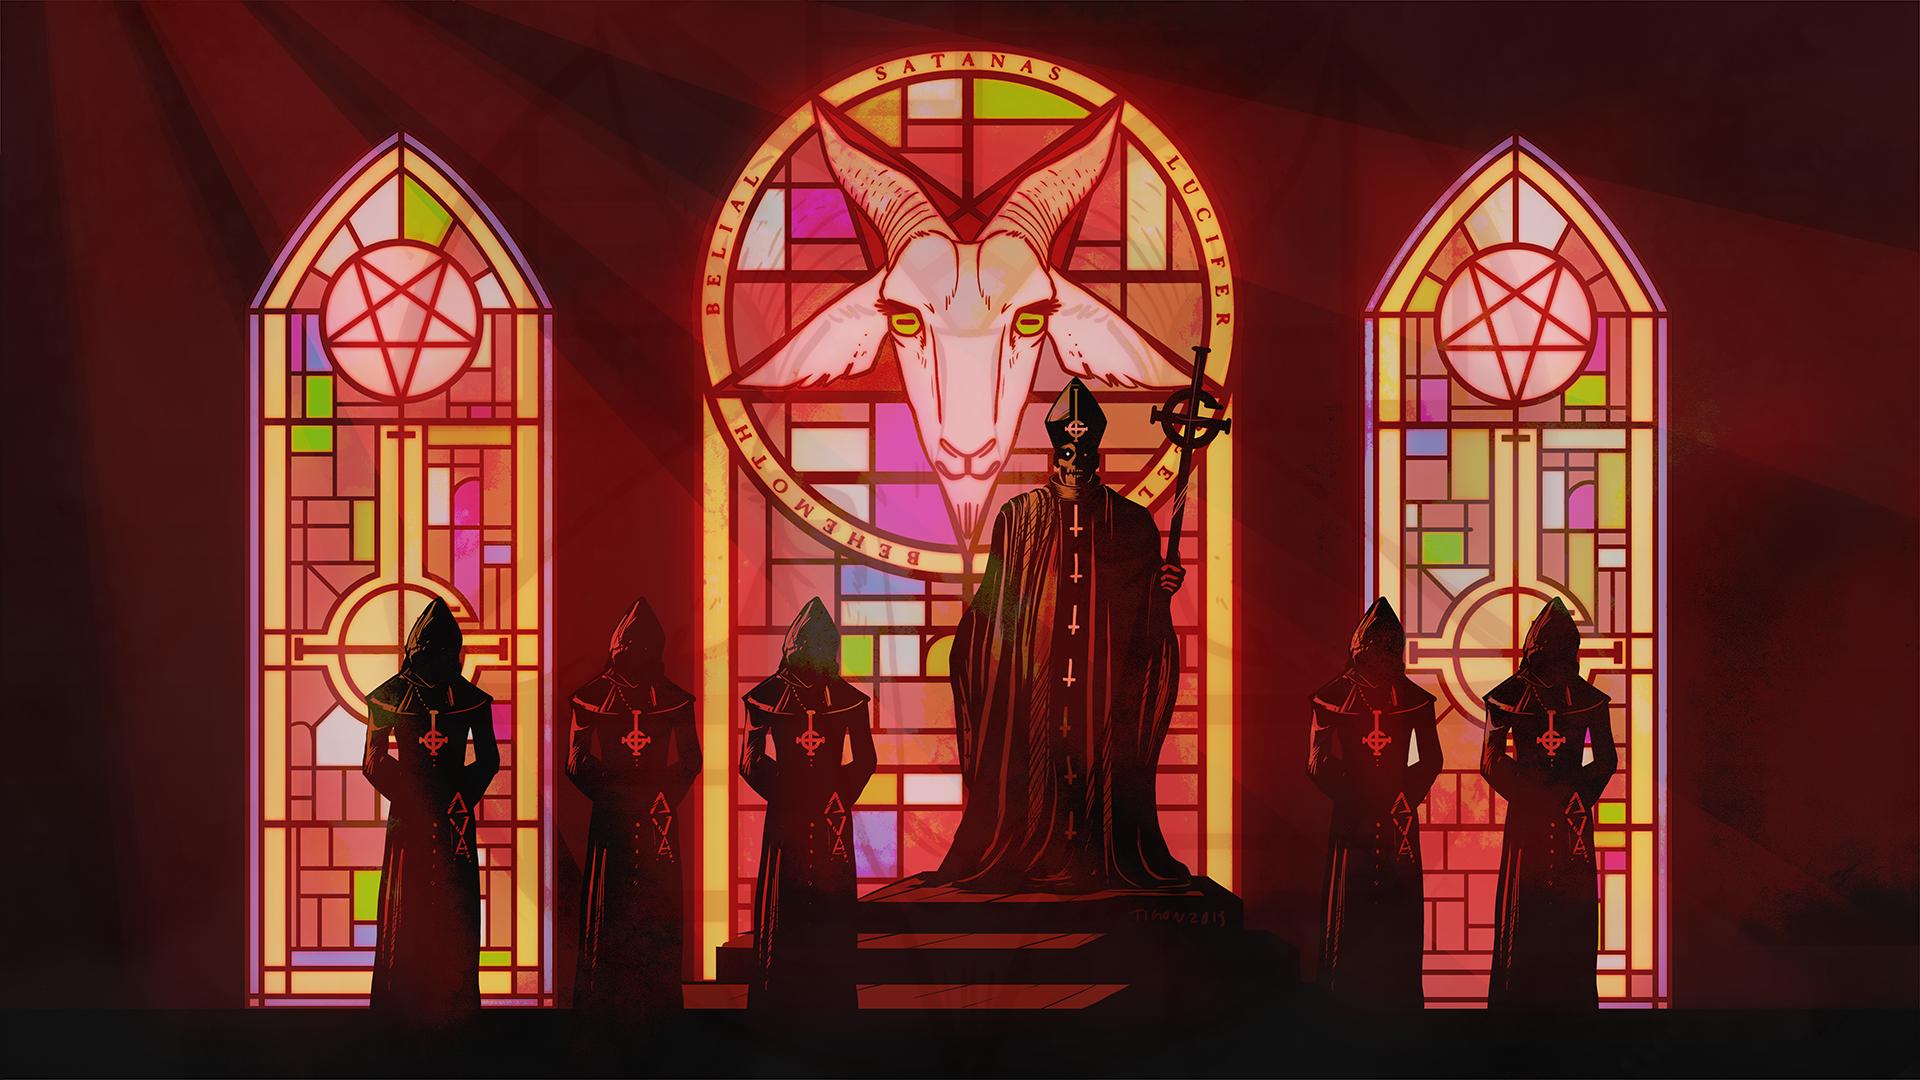 Ghost B C heavy metal black death dark satanic occult satan wallpaper 1920x1080